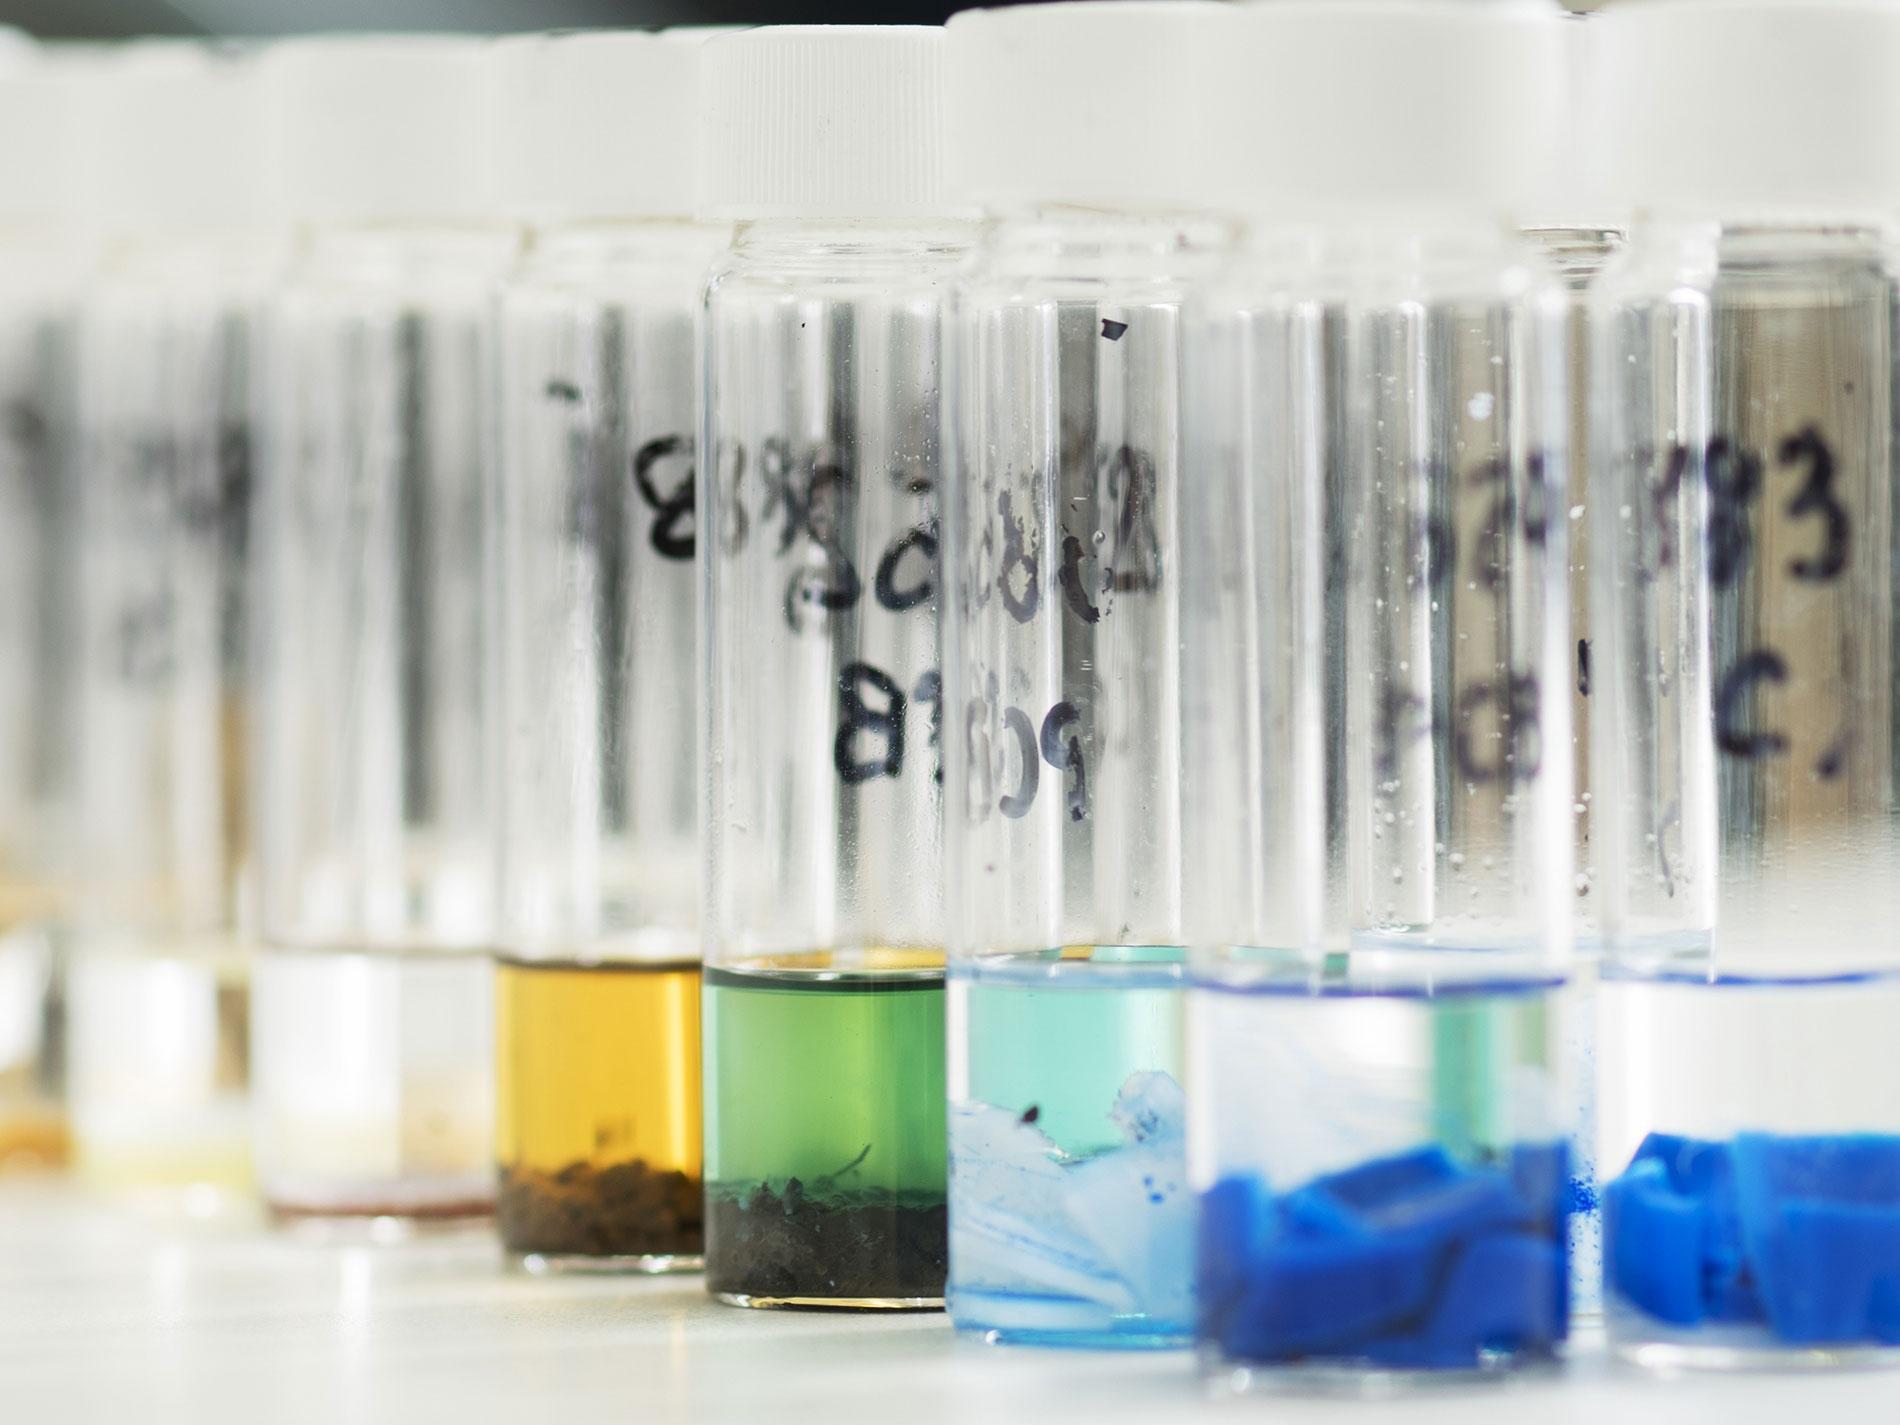 analisi-chimiche-rifiuti-cesena